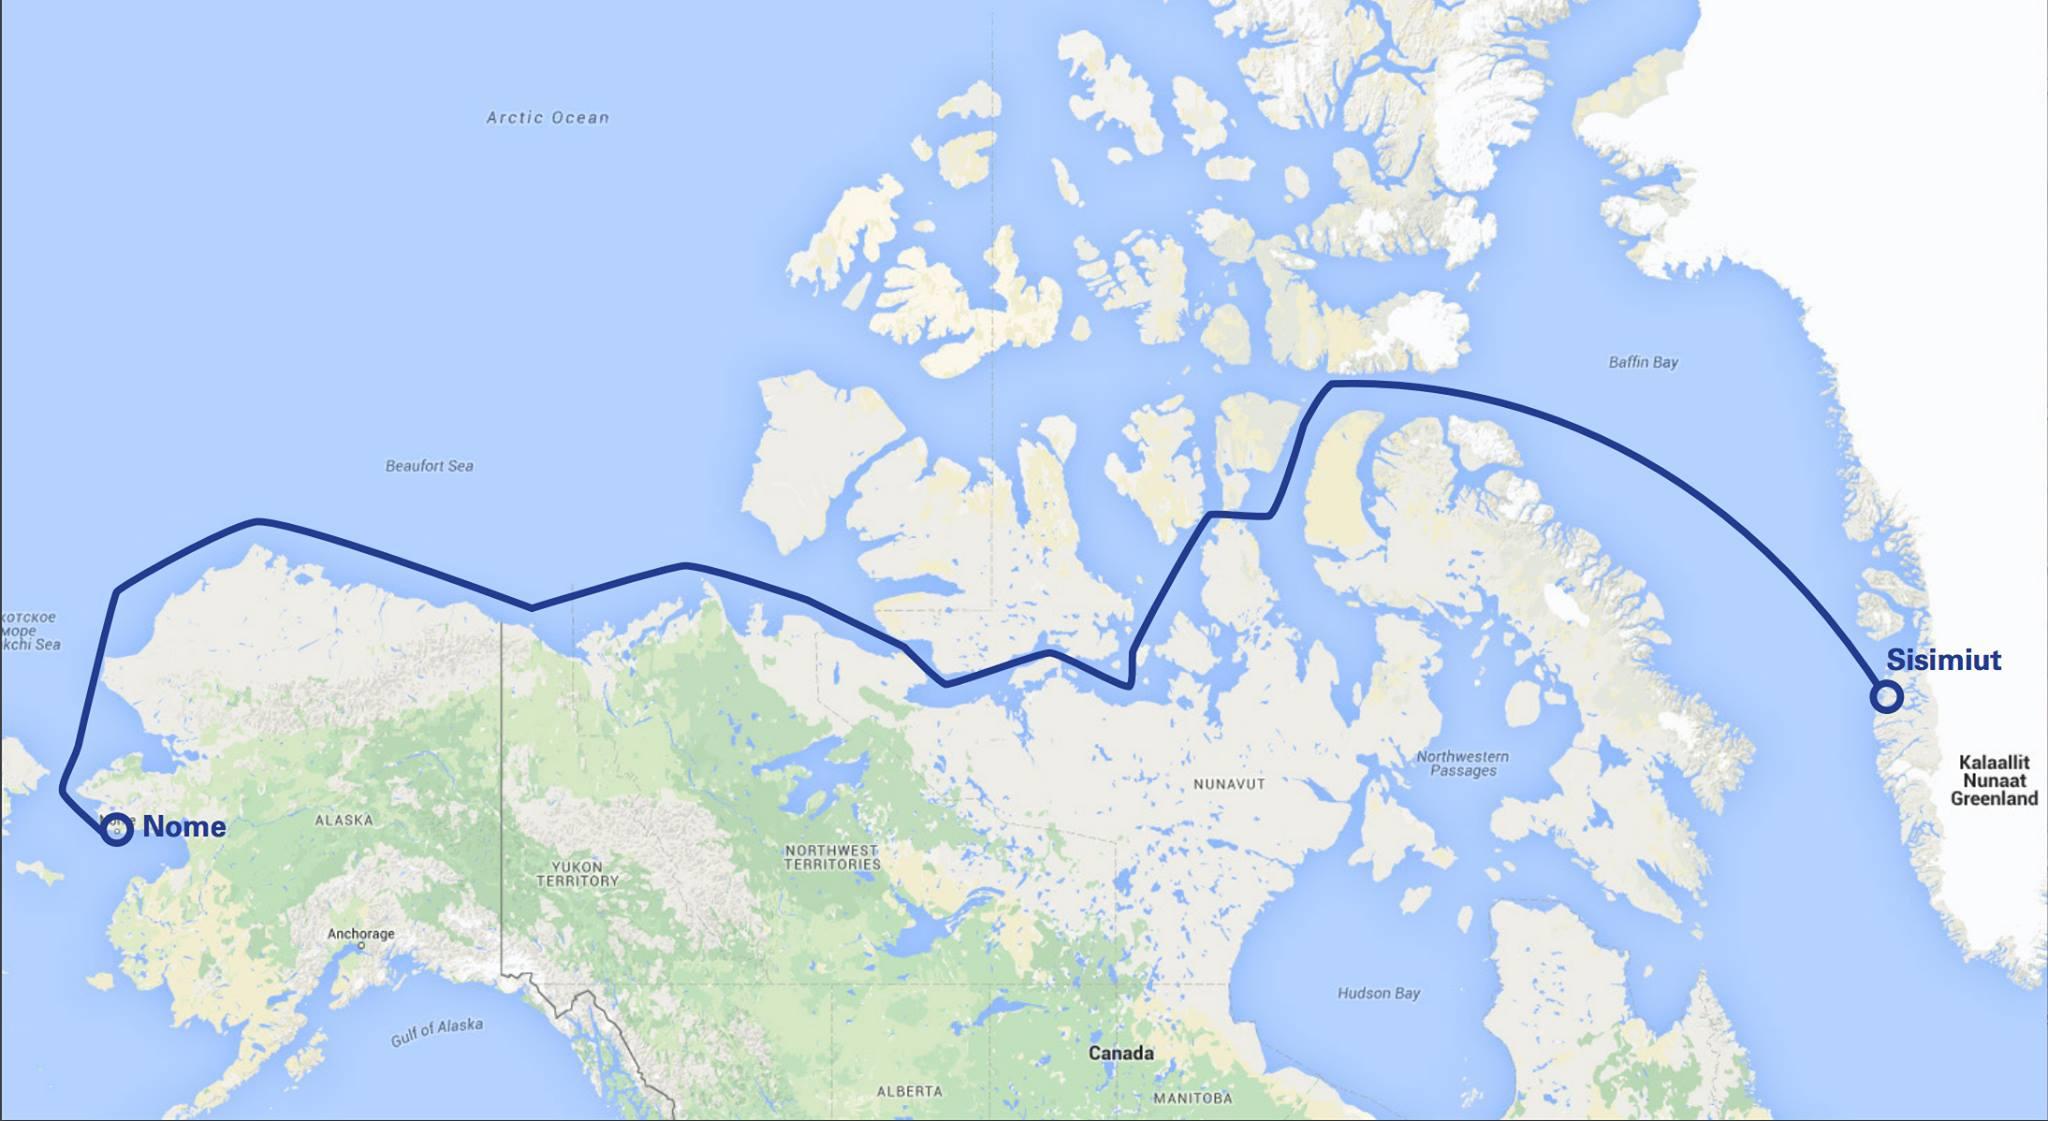 aventure, exploration, polaire, defi, yvan bourgnon, passage nord-ouest, catasport, catamaran, voile, canada, grand nord